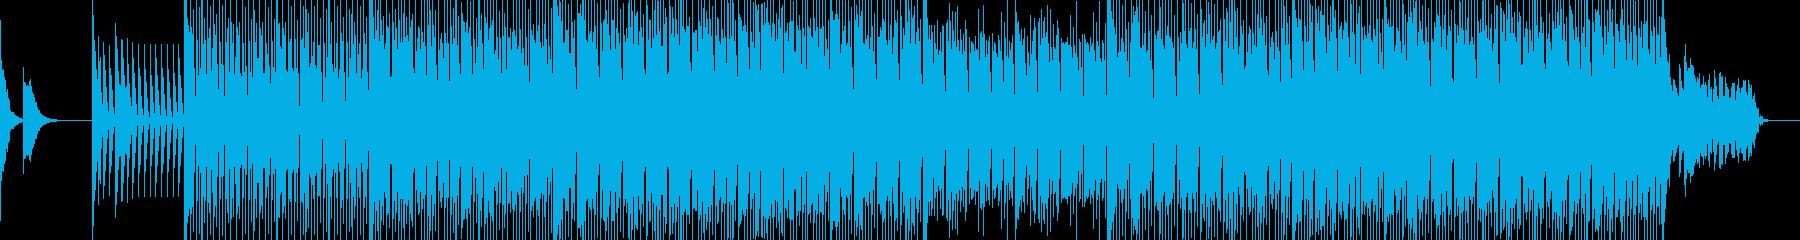 EDMクラブ系ダンスミュージック-125の再生済みの波形